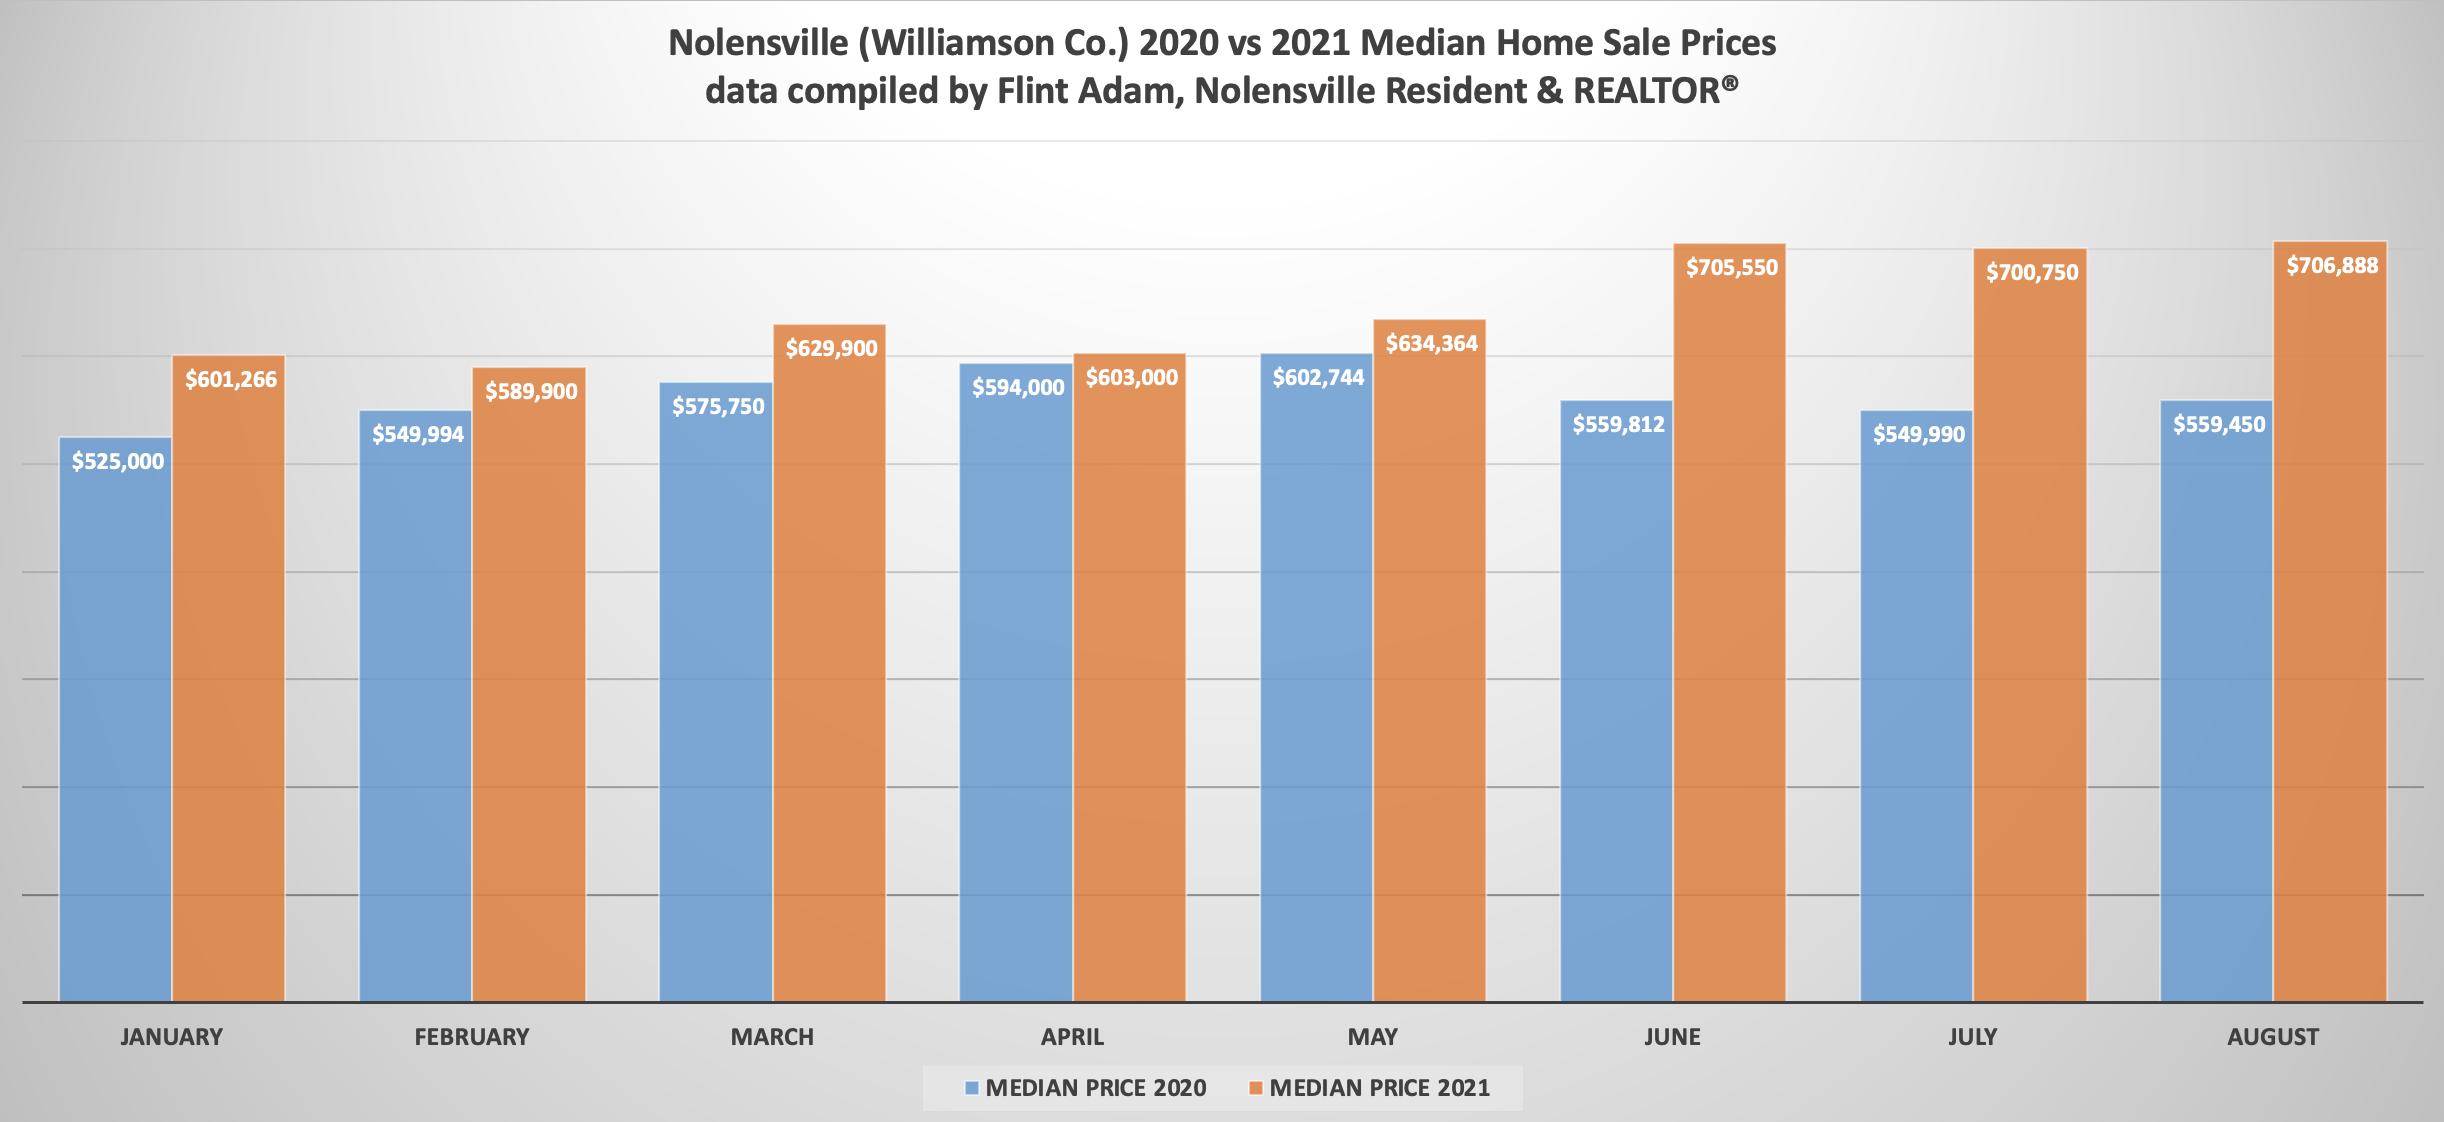 Nolensville 2020 vs 2021 Median Home Prices Comparison - August 2021